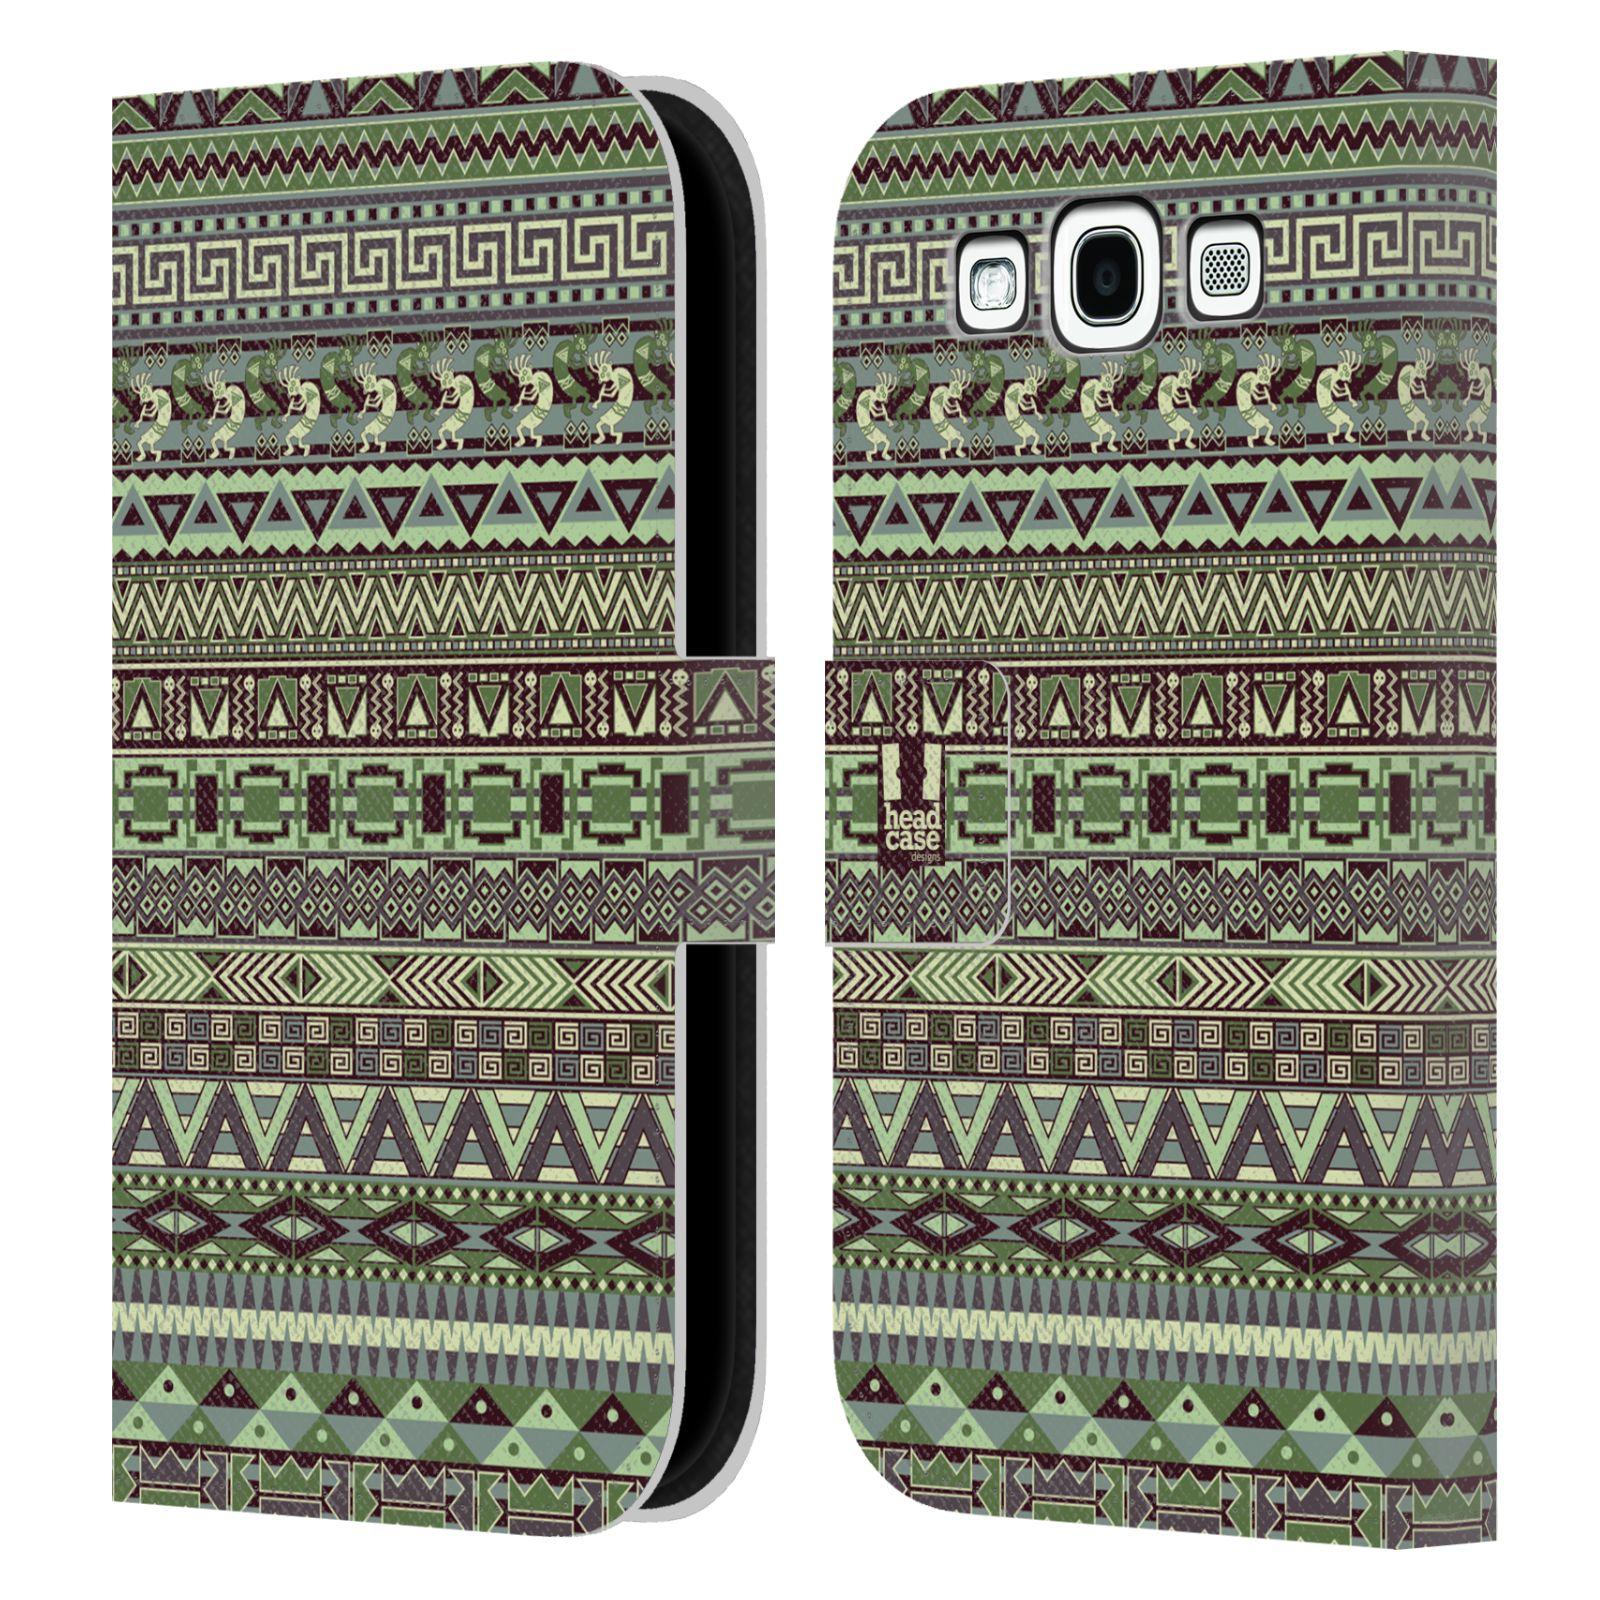 HEAD CASE Flipové pouzdro pro mobil Samsung Galaxy S3 Indiánský vzor GREEN zelená